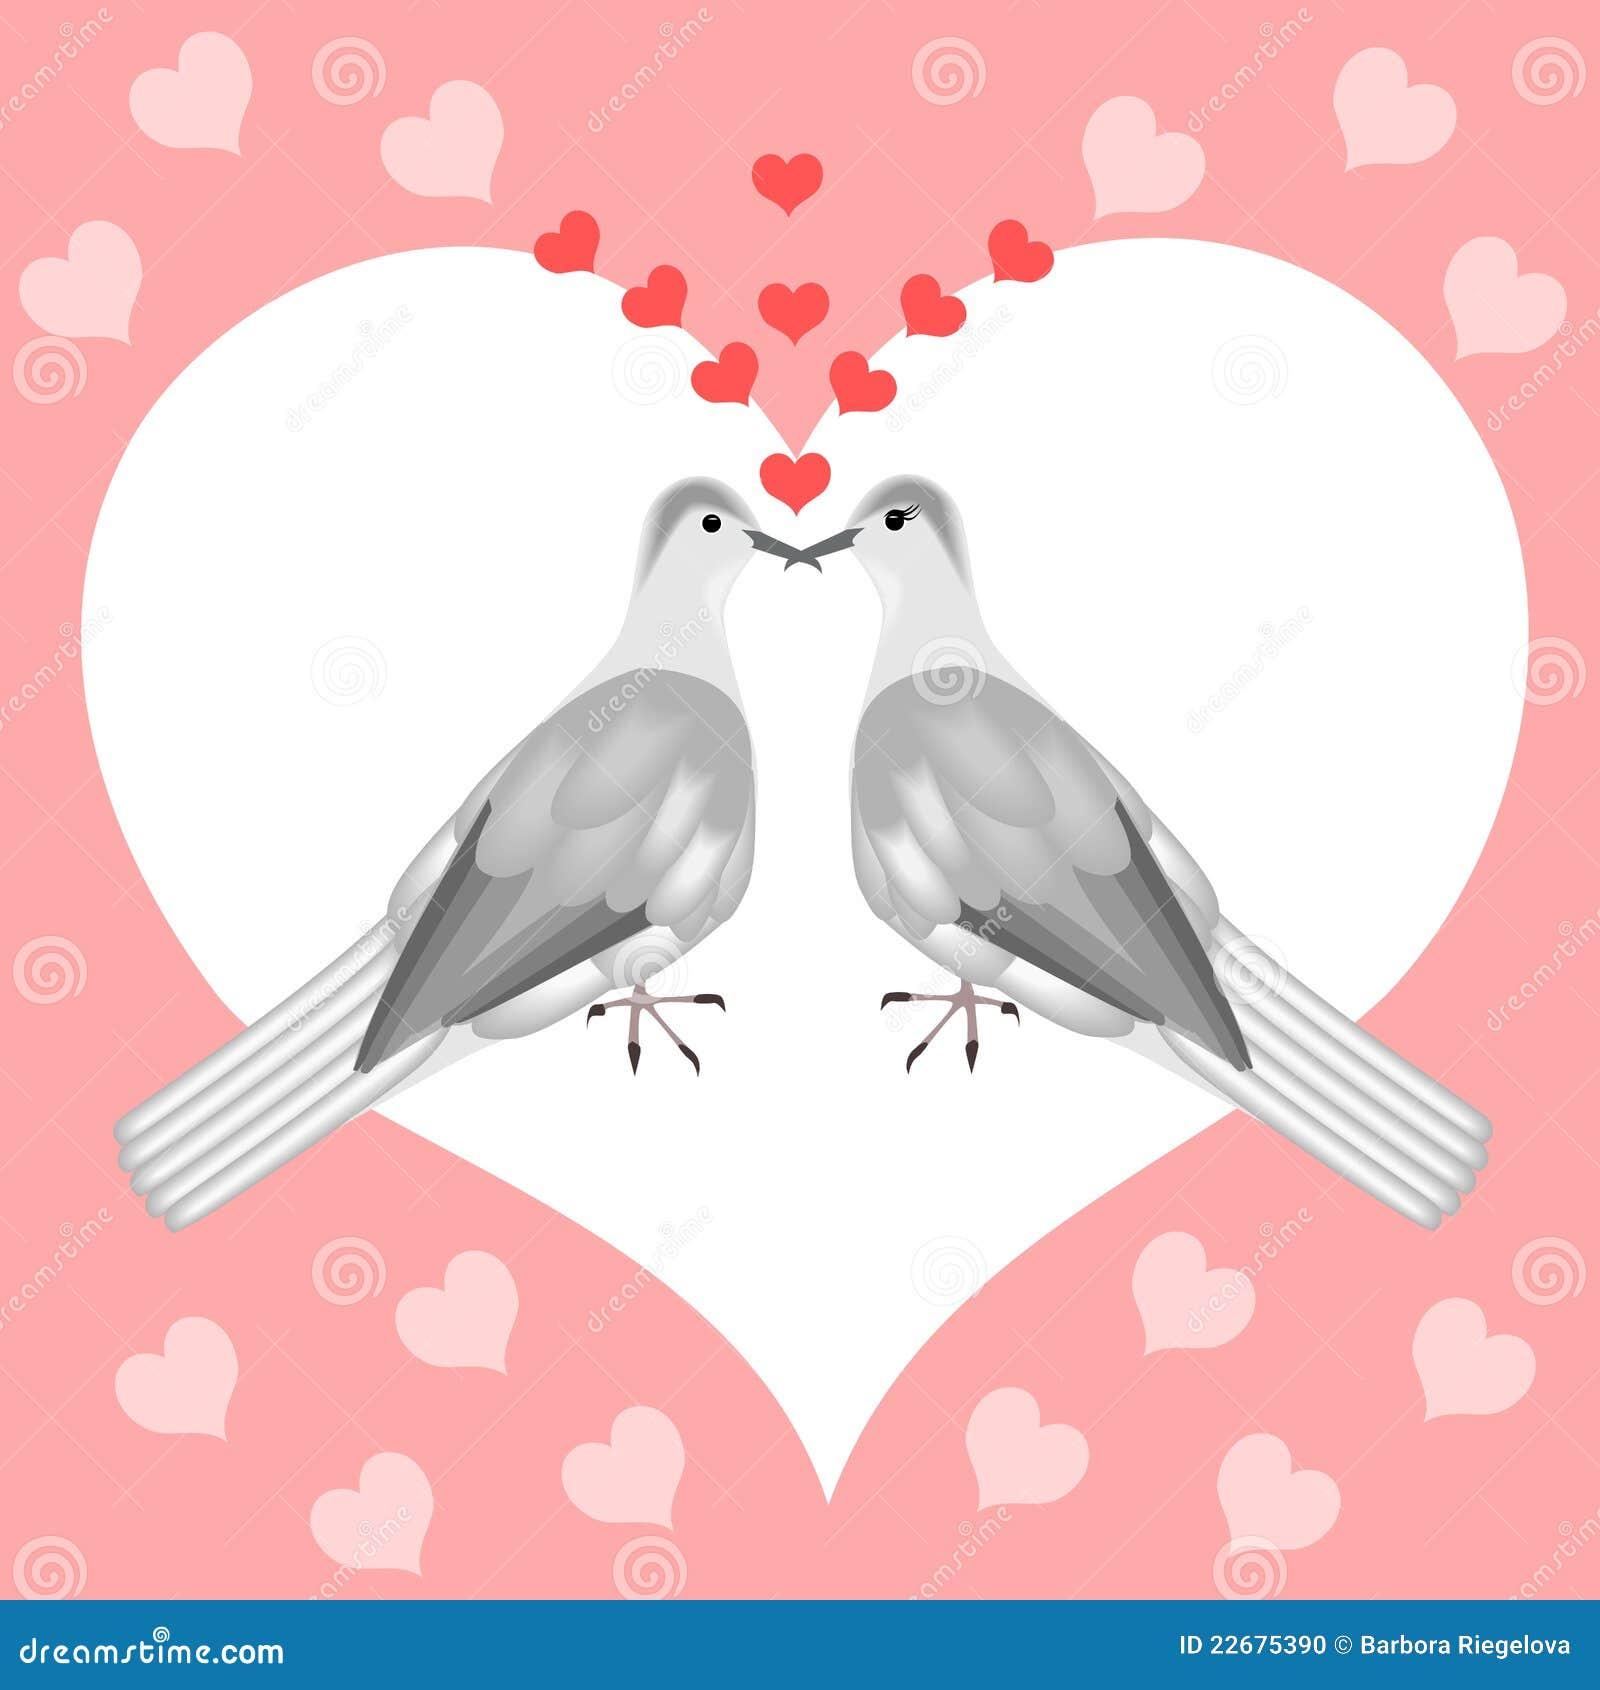 Turtle Doves Stock Photo Image 22675390